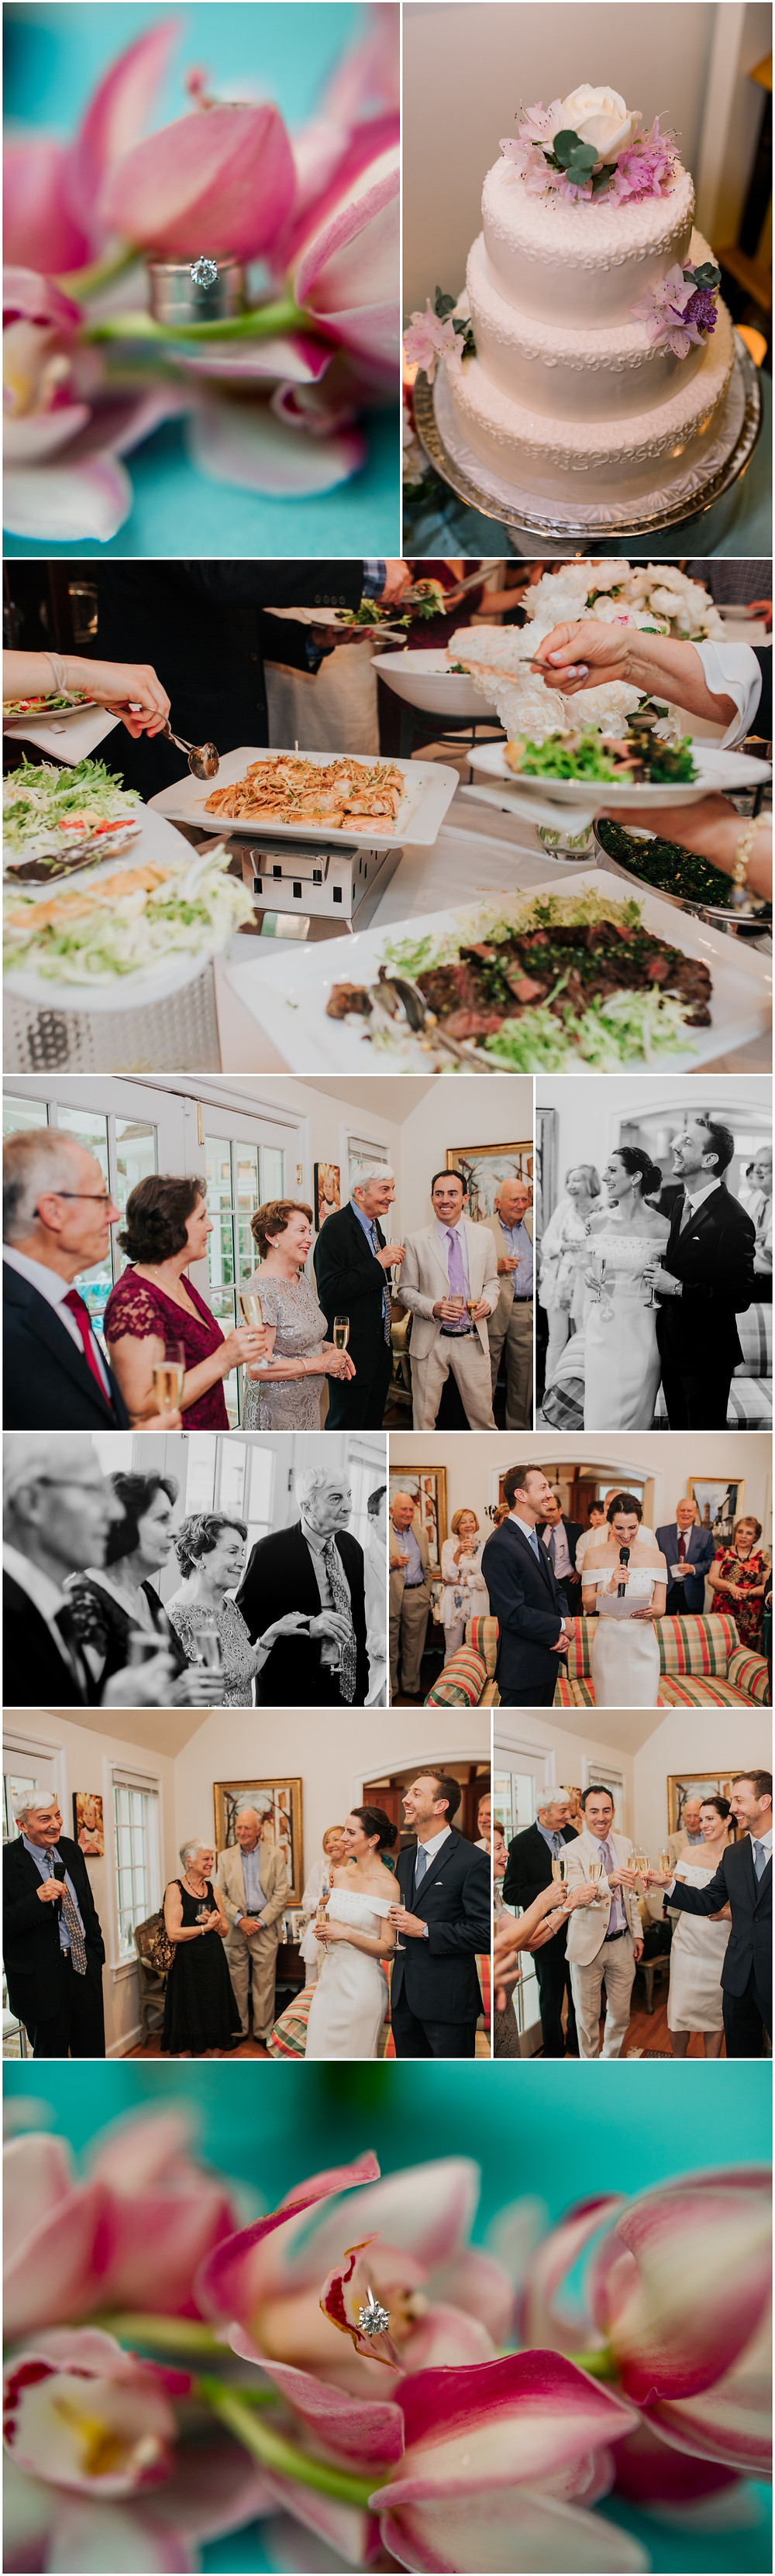 Intimate In-Home Wedding reception - DC Wedding Photographer